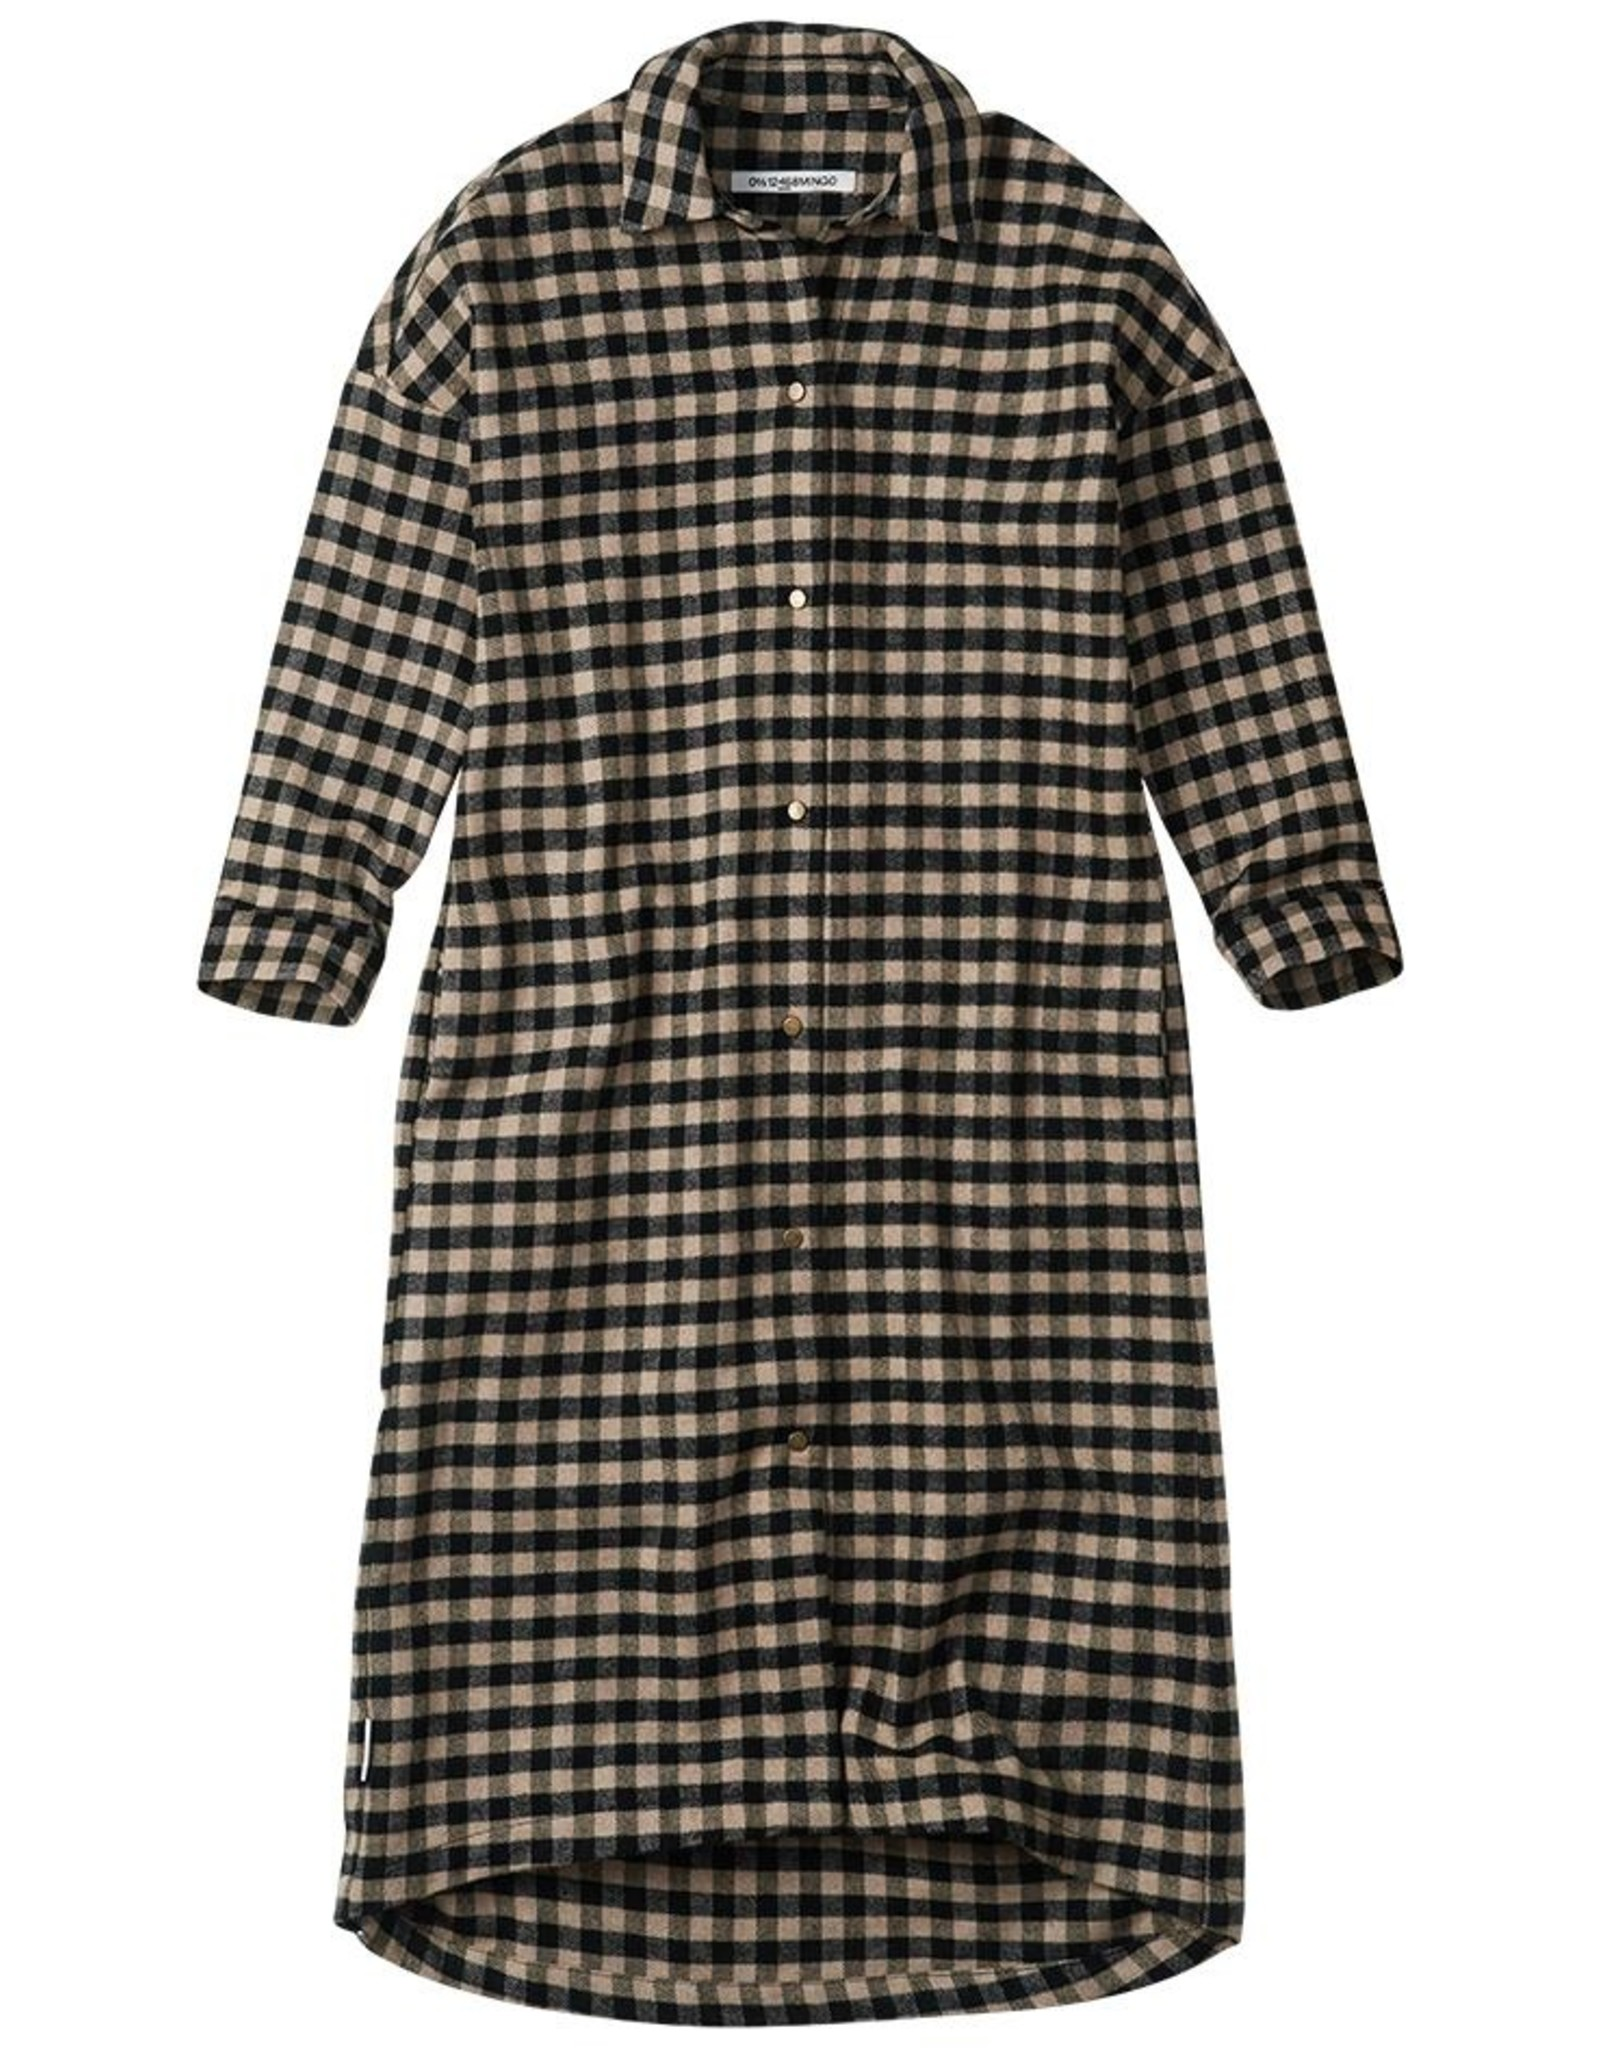 Mingo Flannel shirt dress